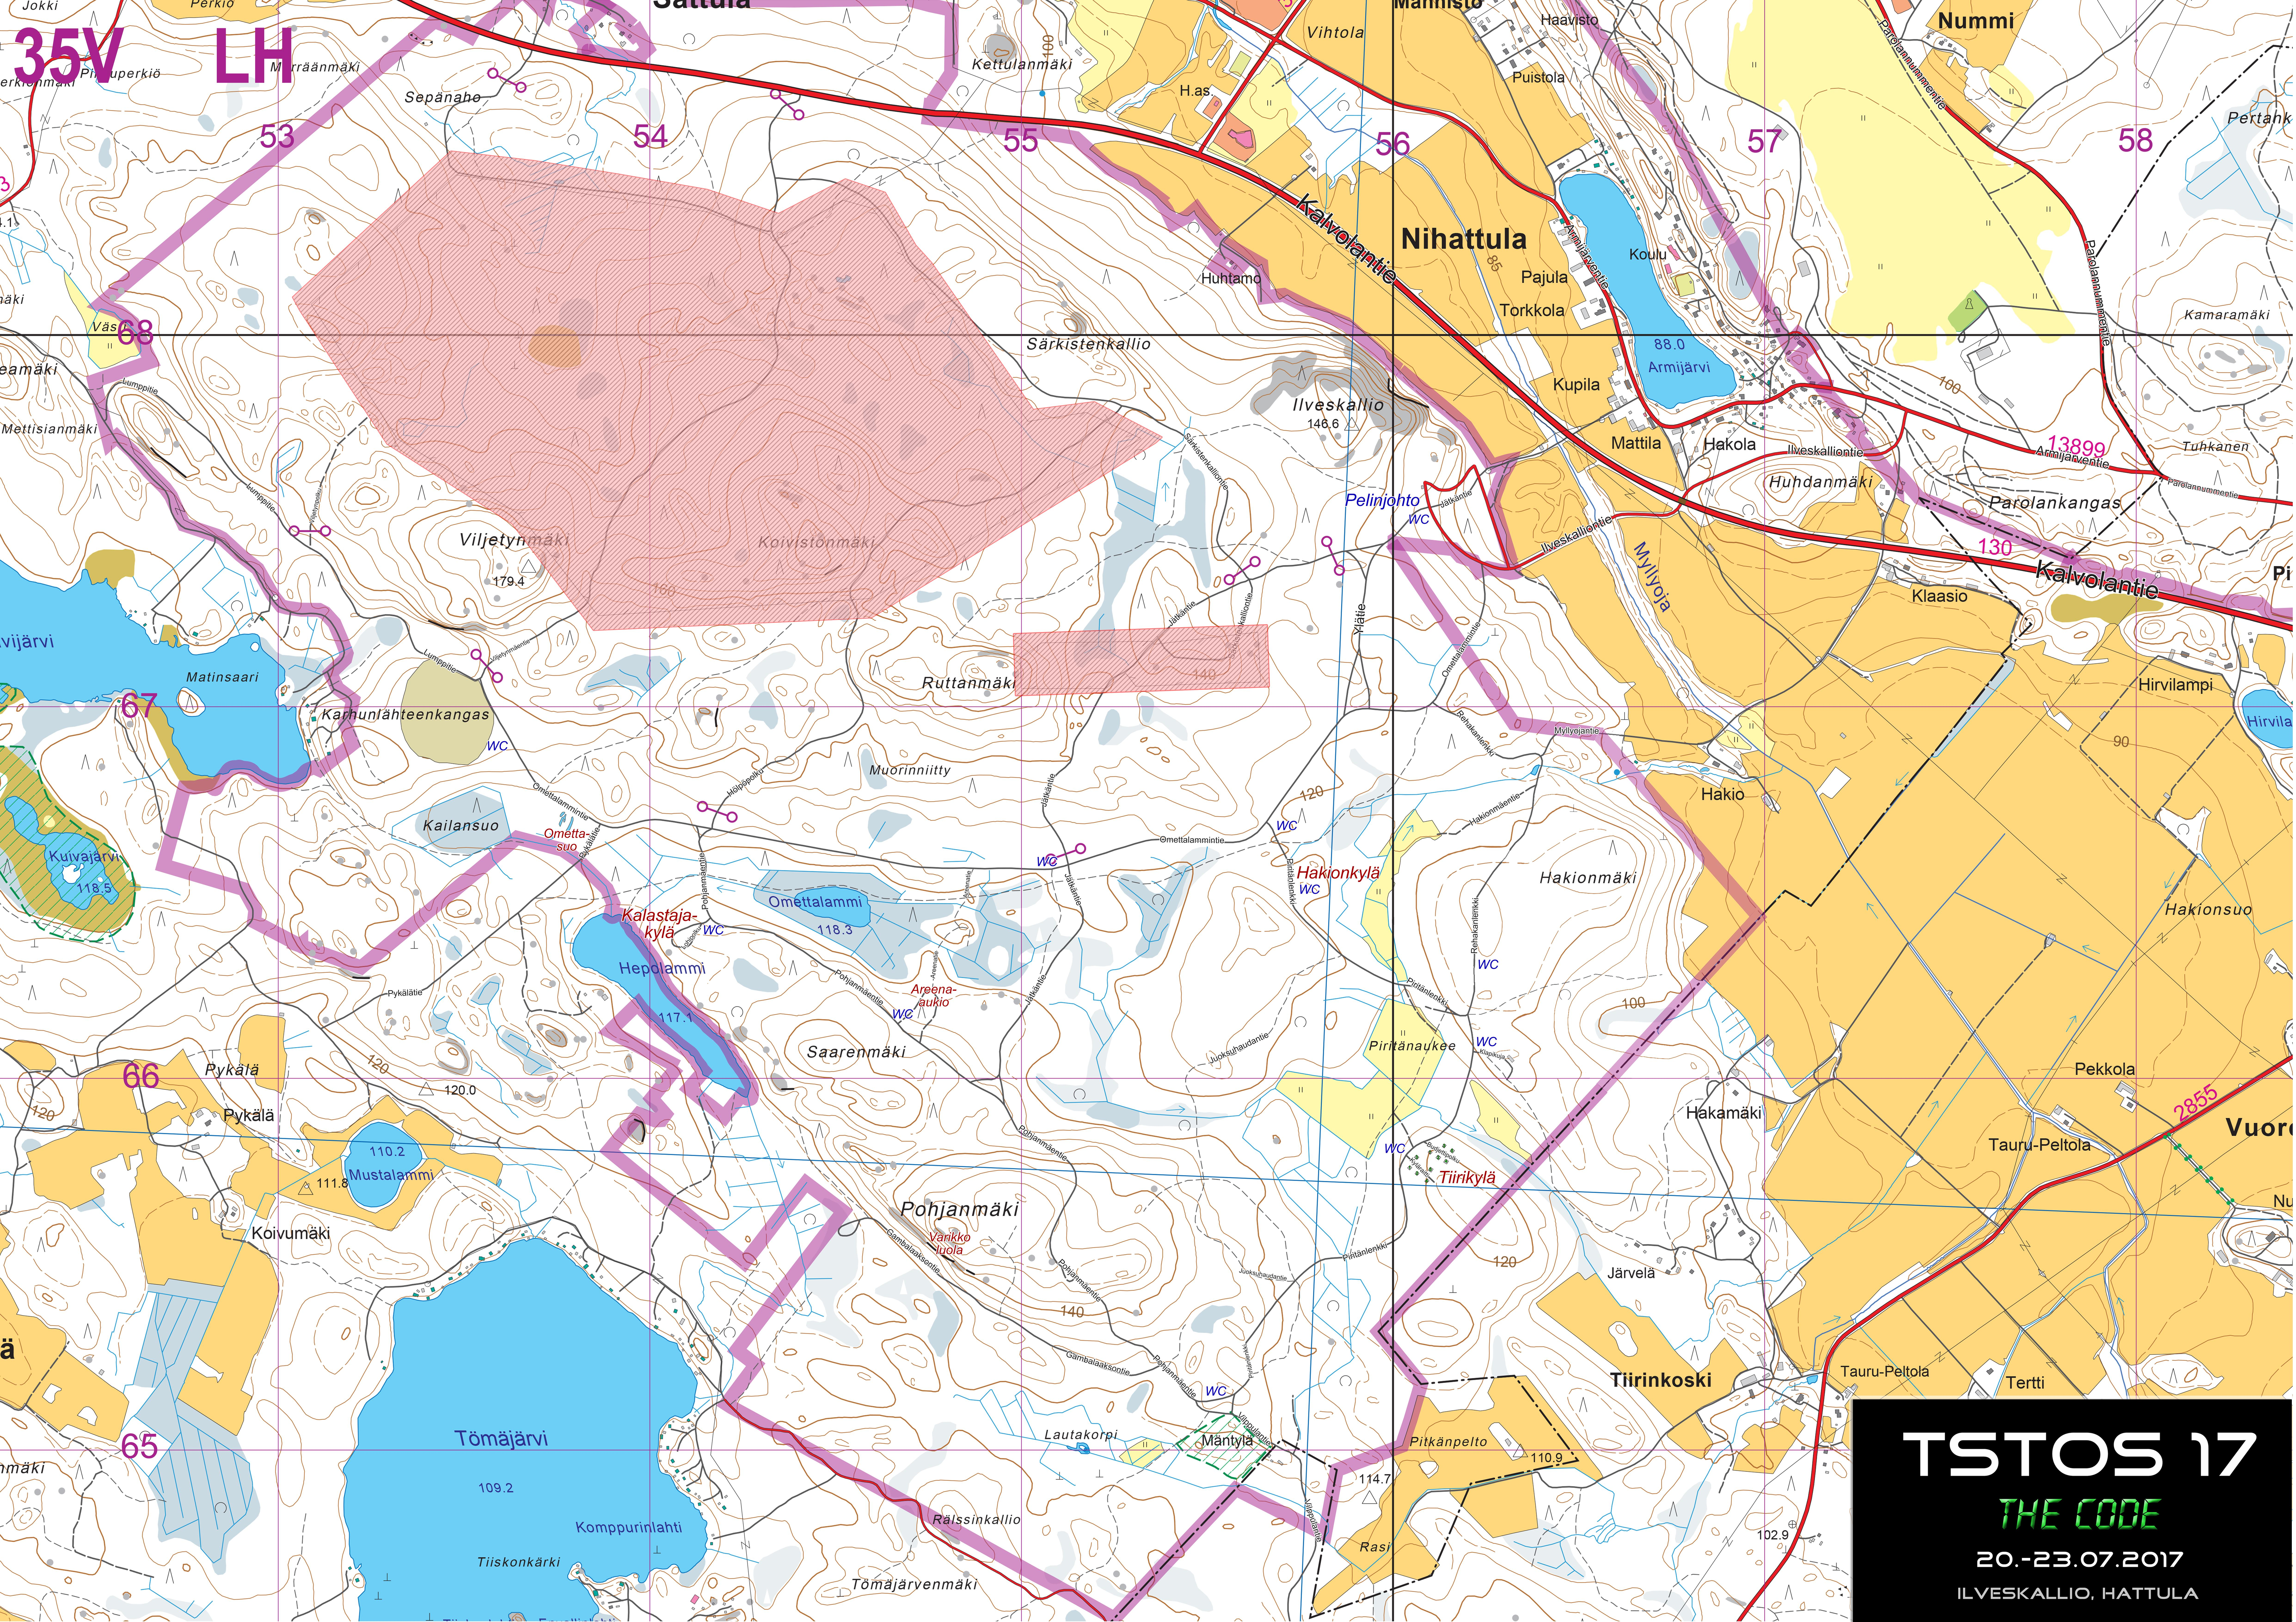 TSTOS - Mgrs maps for sale